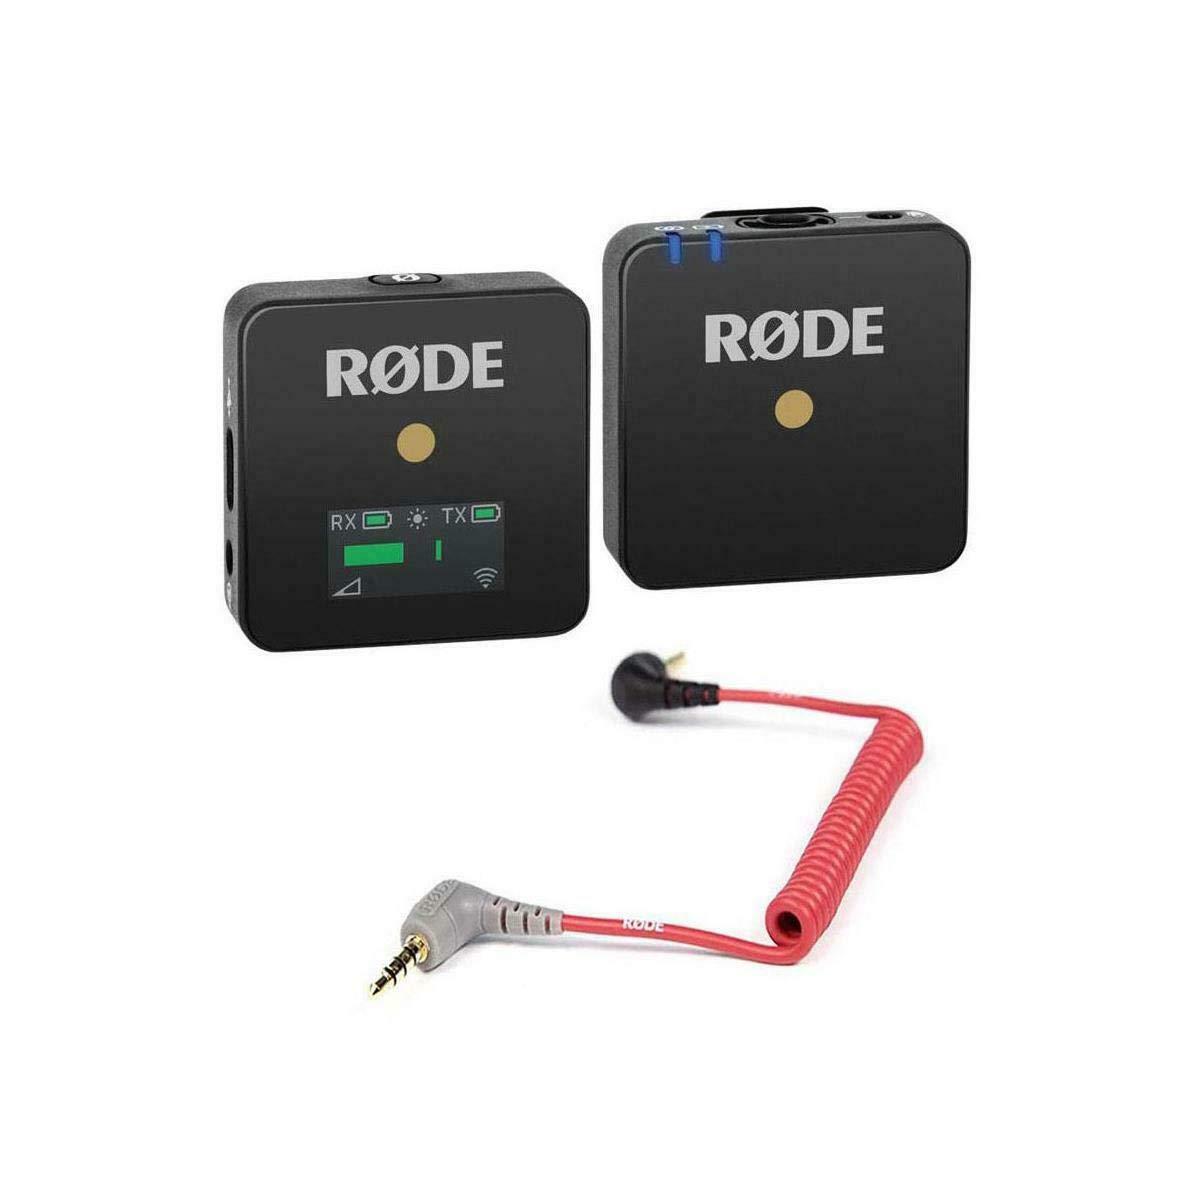 Rode - Transmisor y Receptor de micrófono inalámbrico GO Compacto ...